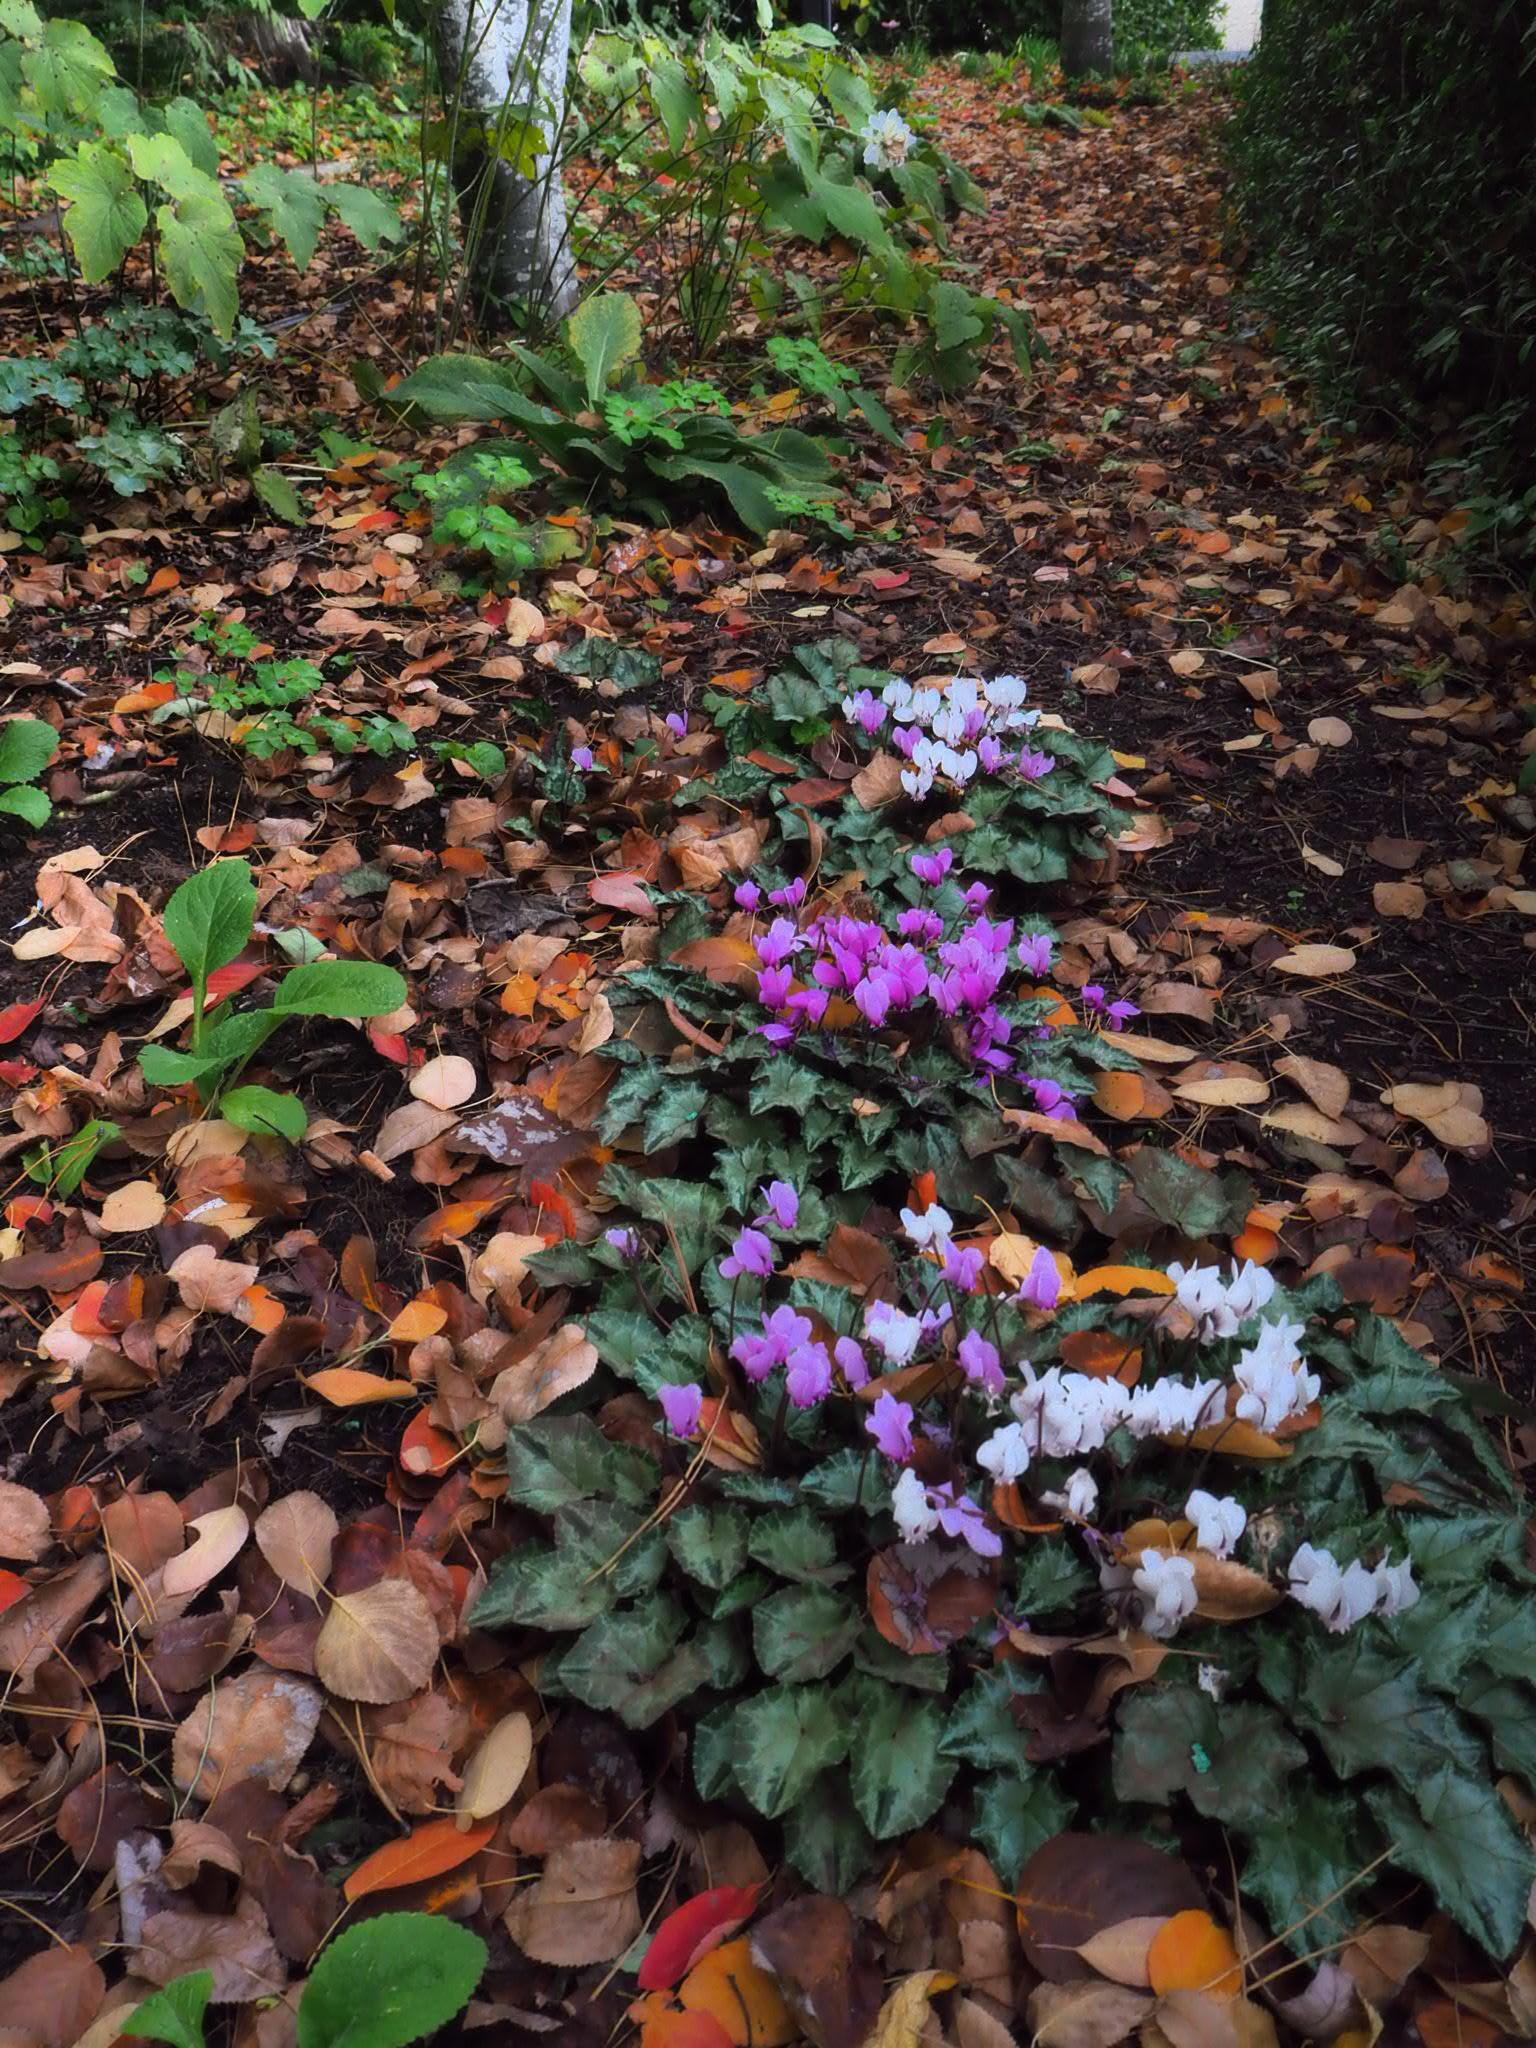 muskfarm_tank_garden_flowers_daylesford.JPG